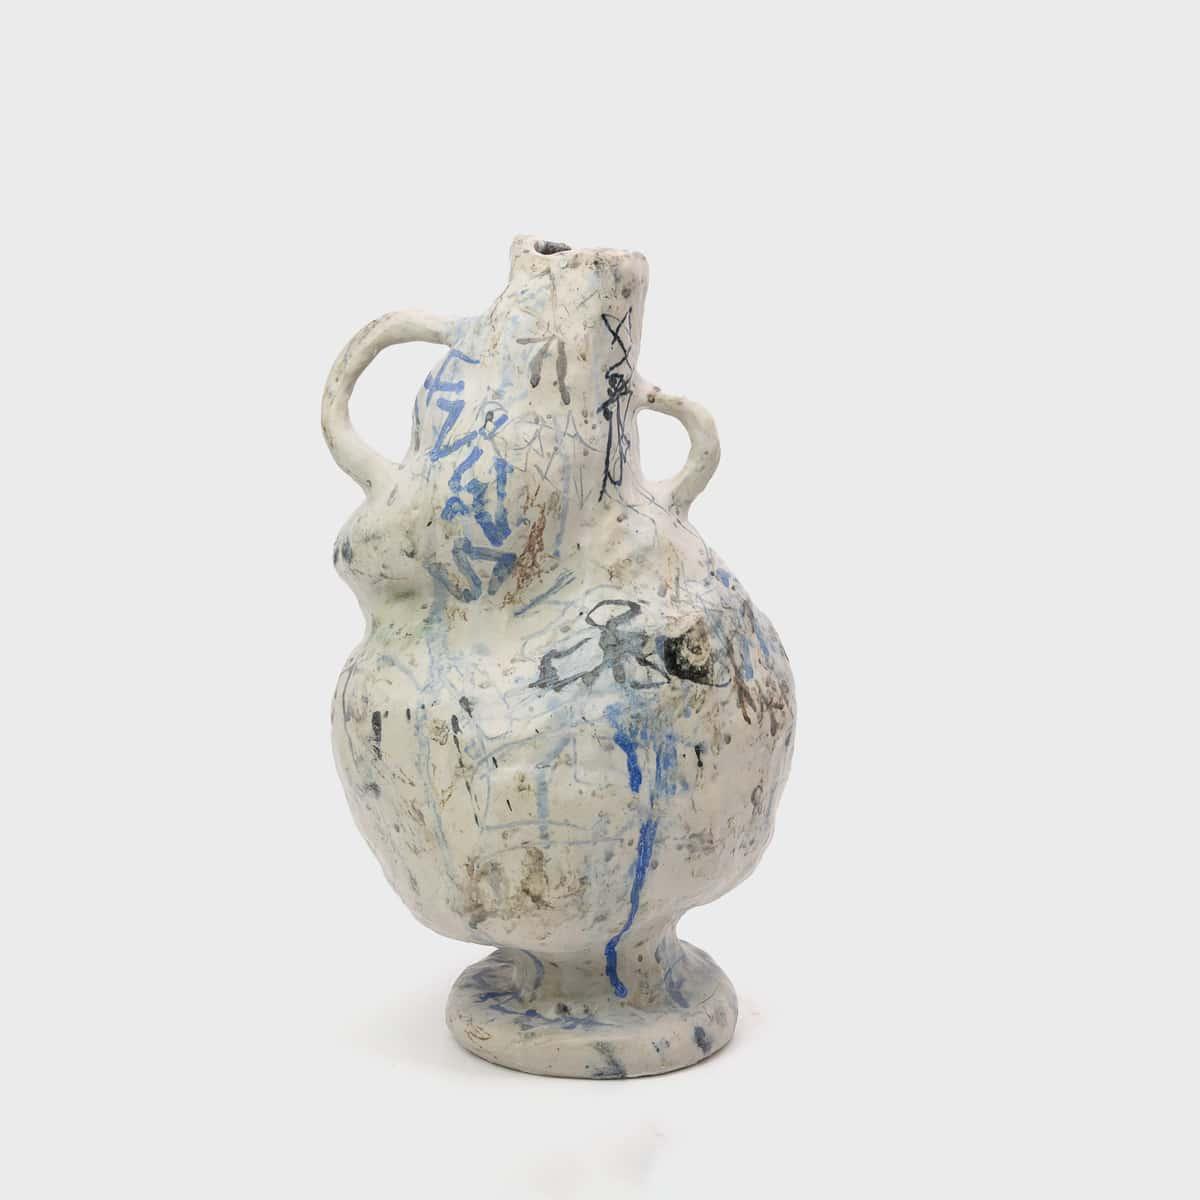 Philip Hedegaard Graffiti Vase